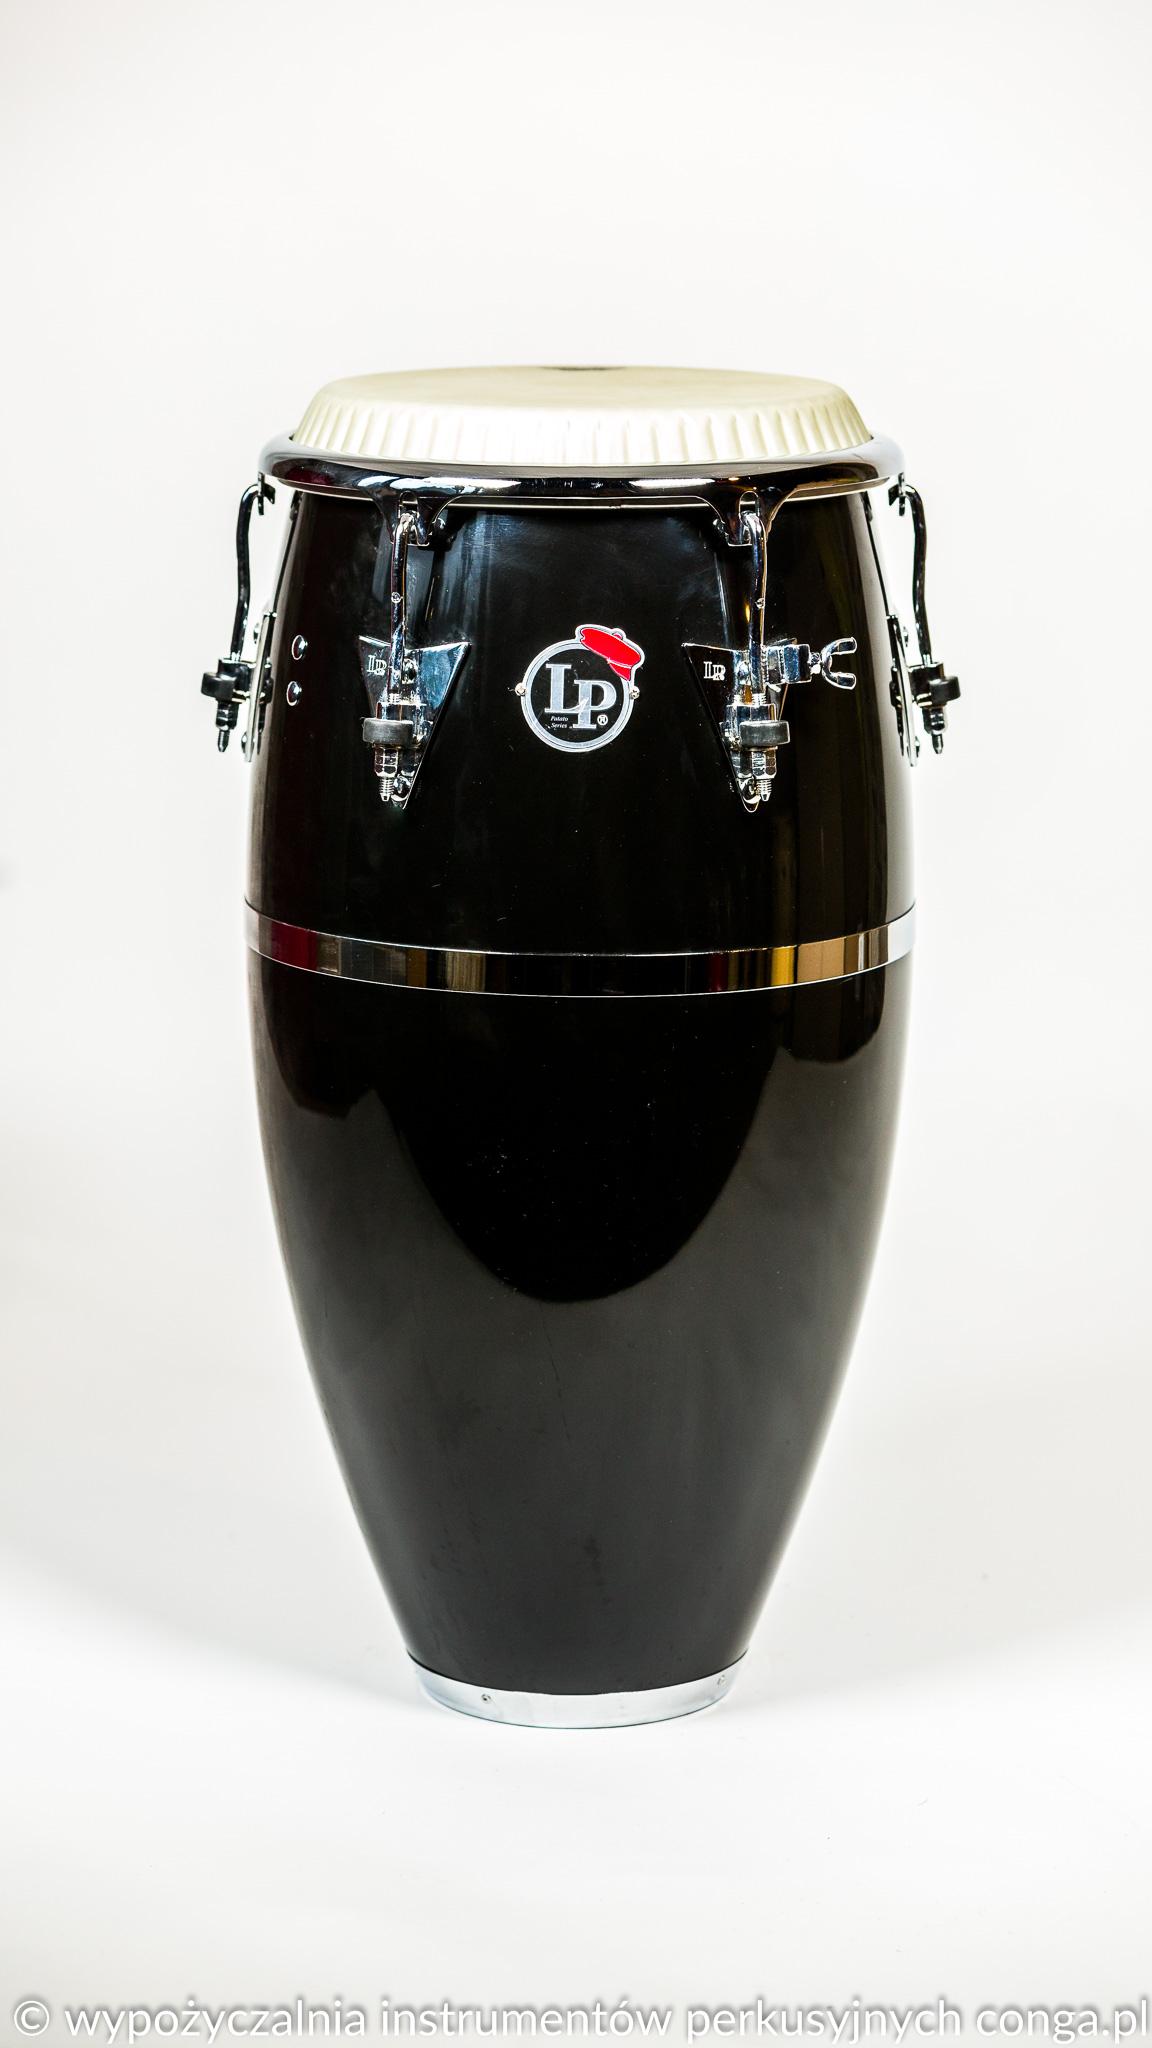 LP559X-1BK-PATATO-SIGNATURE-FIBRGLASS-CONGA--Wypożyczalnia-instrumentów-perkusyjnych--CONGA.PL-0264.jpg